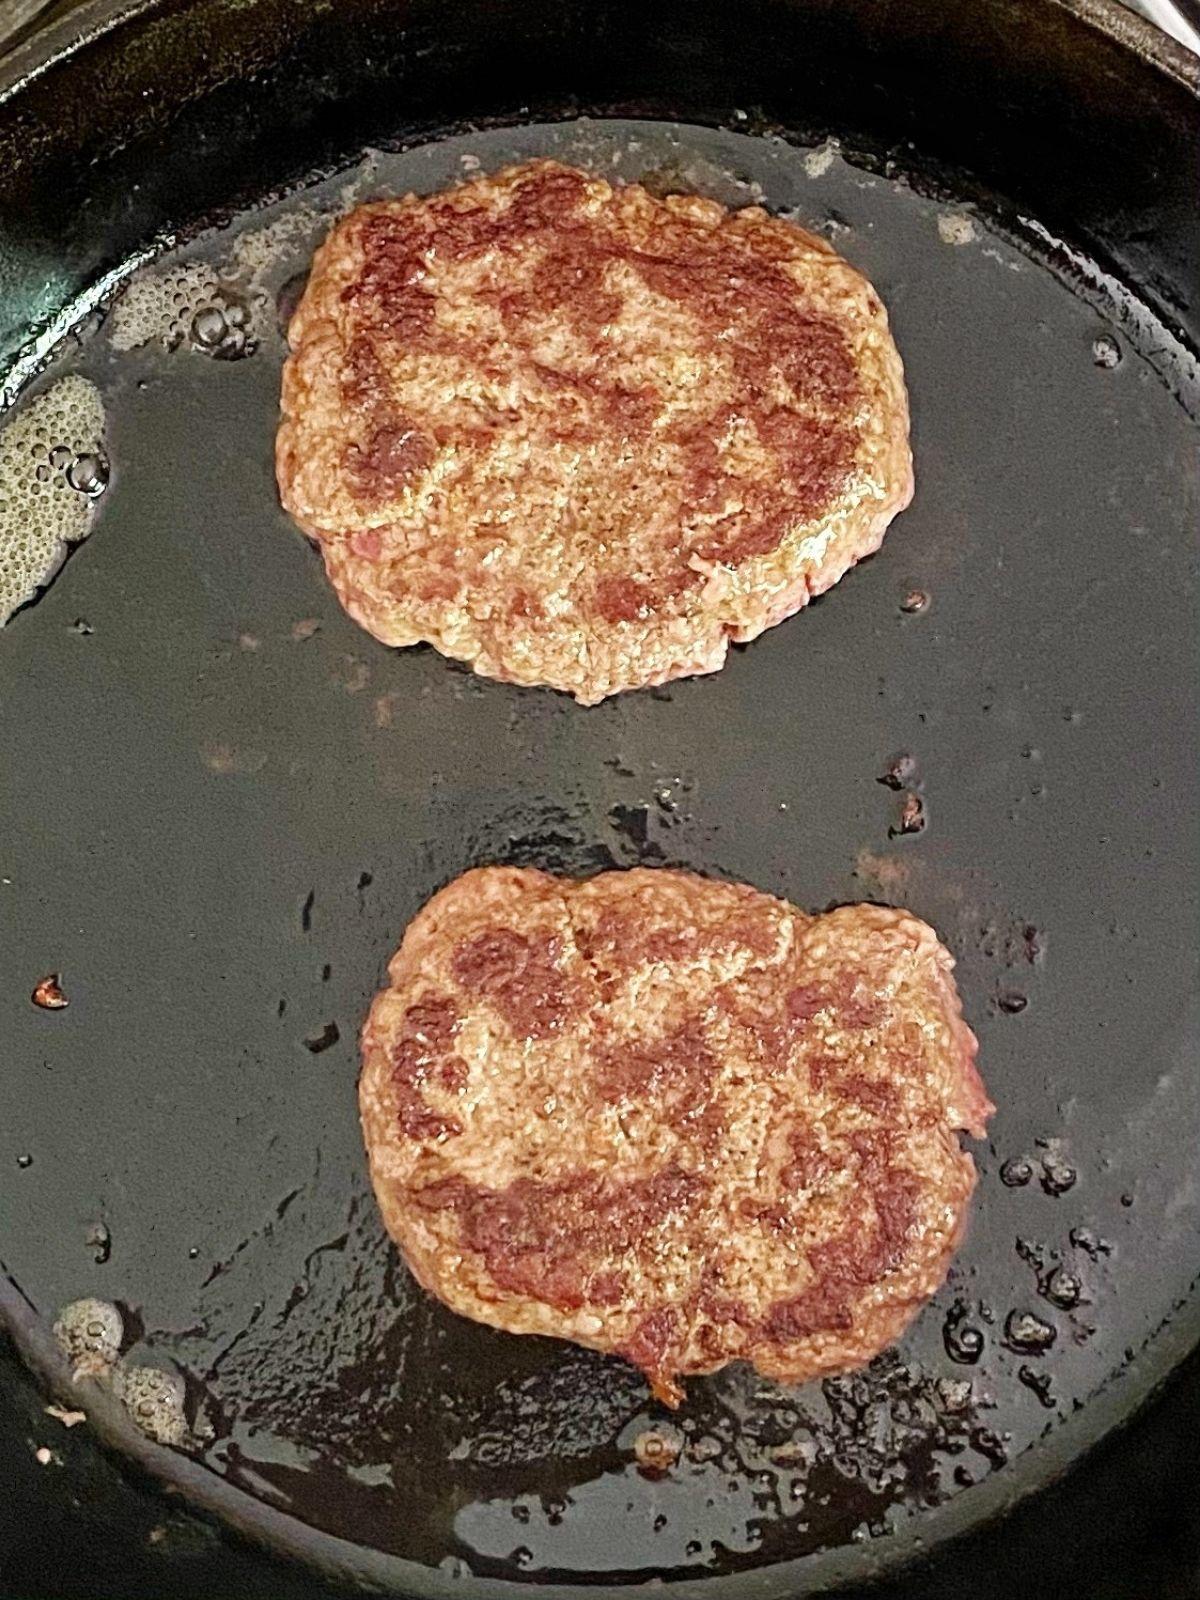 burgers cooking in skillet